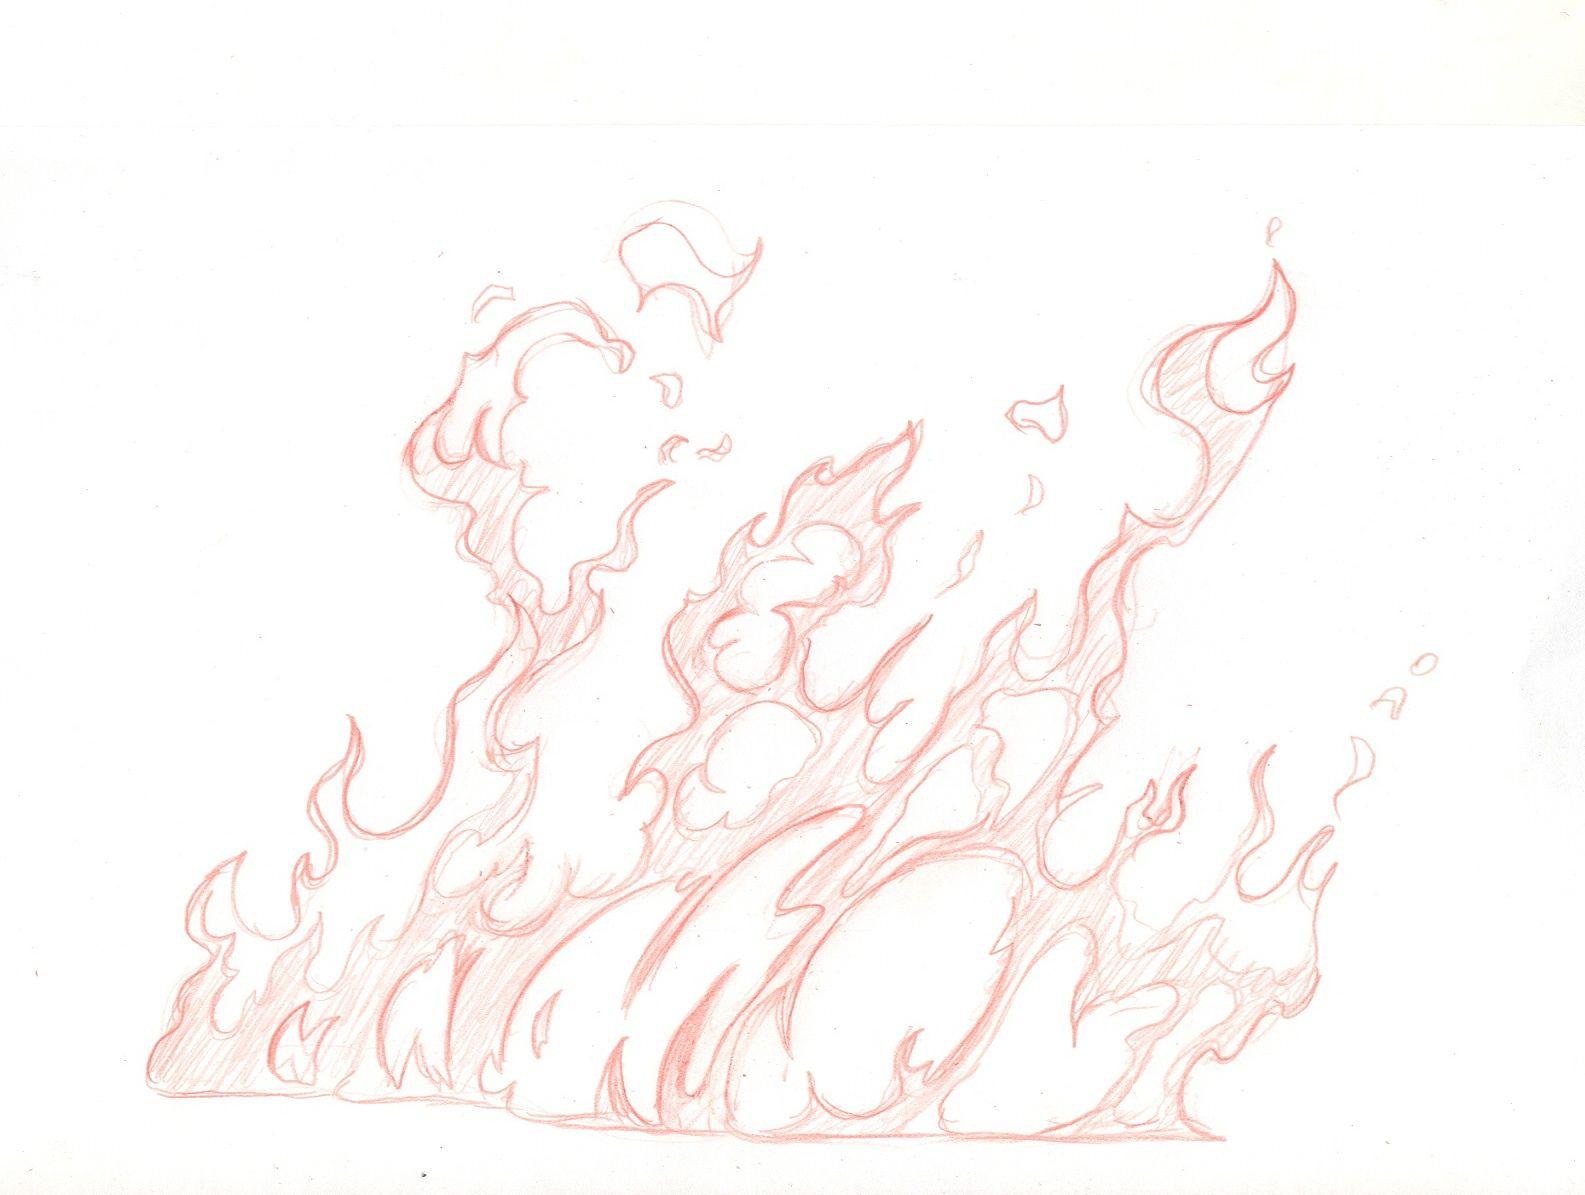 1585x1195 Wild Fire.jpg Mural Massive Gothic Art